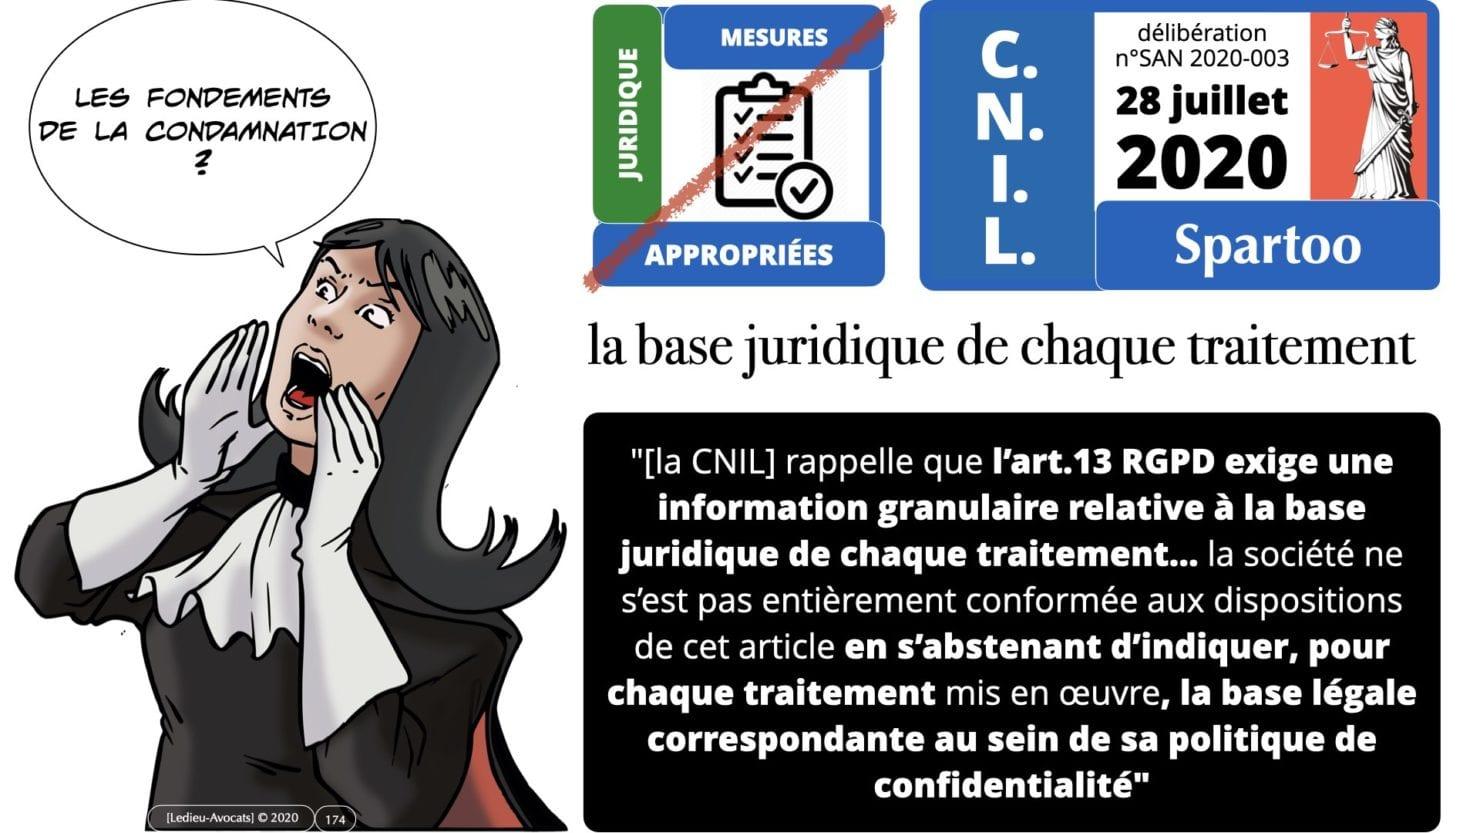 RGPD e-Privacy principes actualité jurisprudence ©Ledieu-Avocats 25-06-2021.174